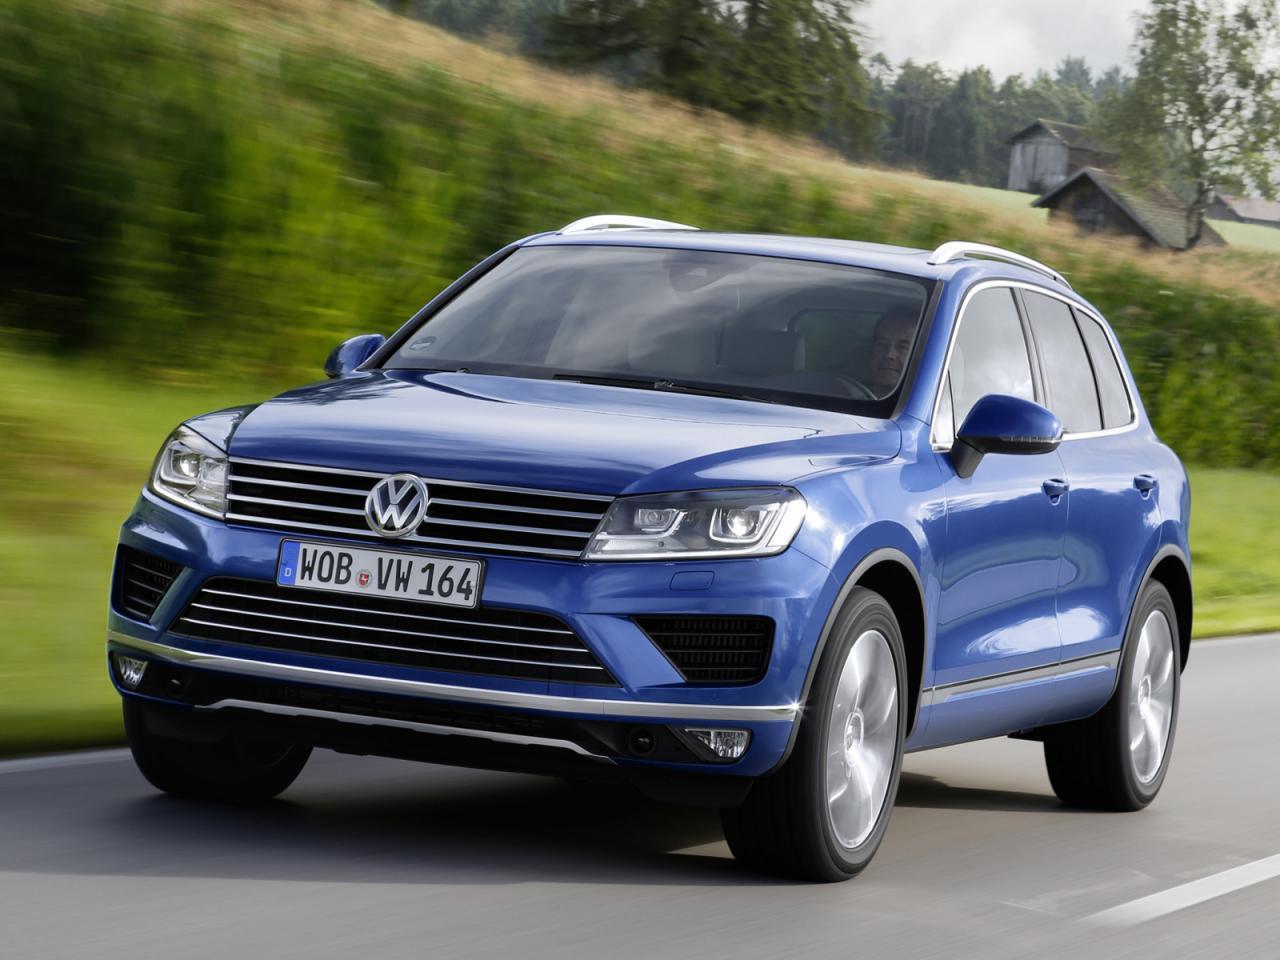 2015 Volkswagen Touareg V6 Tdi Gets Mild Power Boost